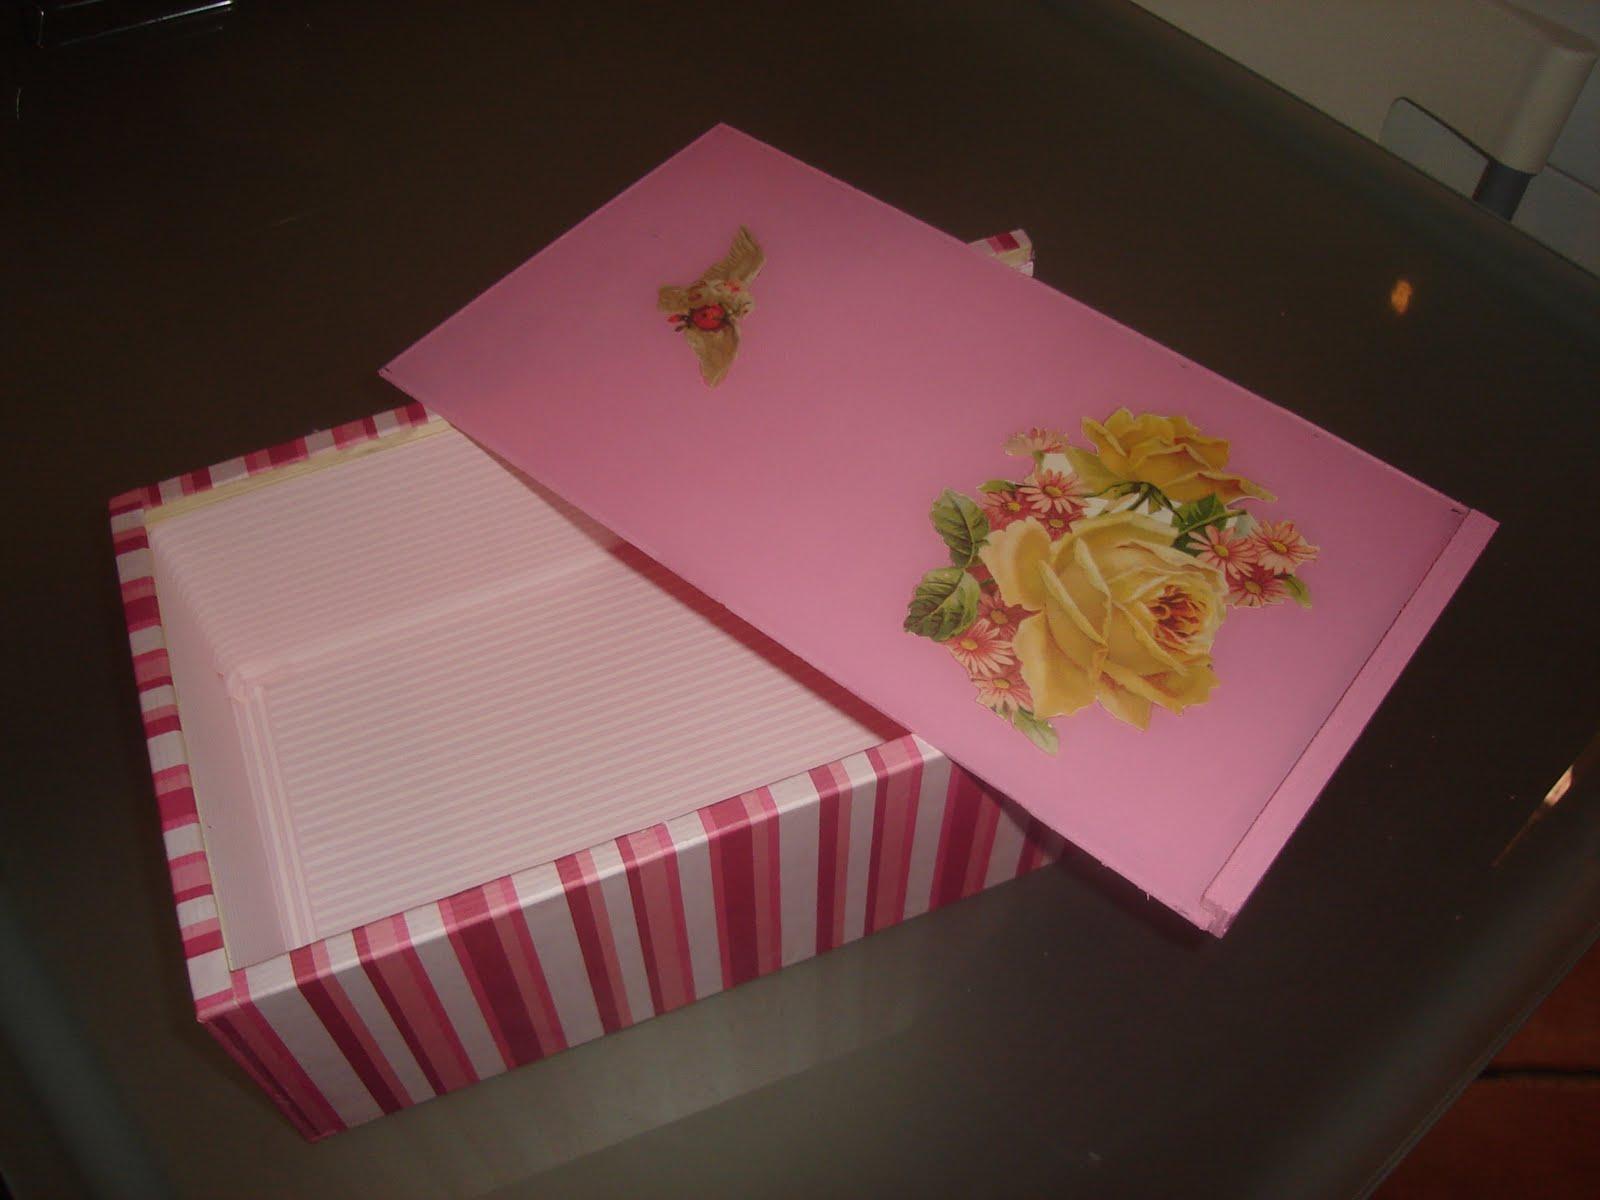 Manualidades de pepi caja de madera con decoupage - Manualidades con cajas de madera ...